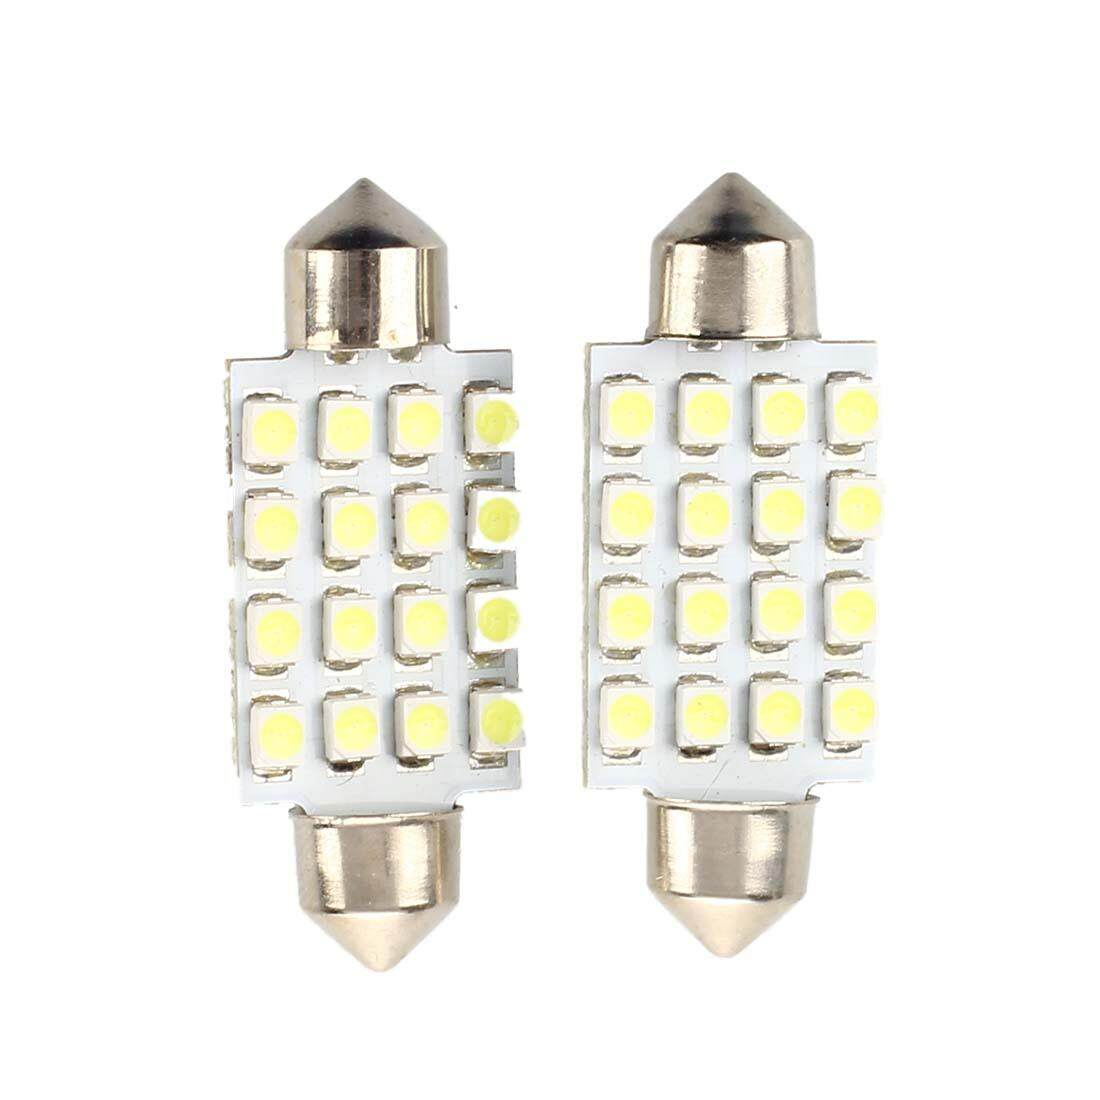 2 PCS Car Lamp Soffitte Indoor 42mm 16 SMD LED White Sofitte - intlIDR32000. Rp